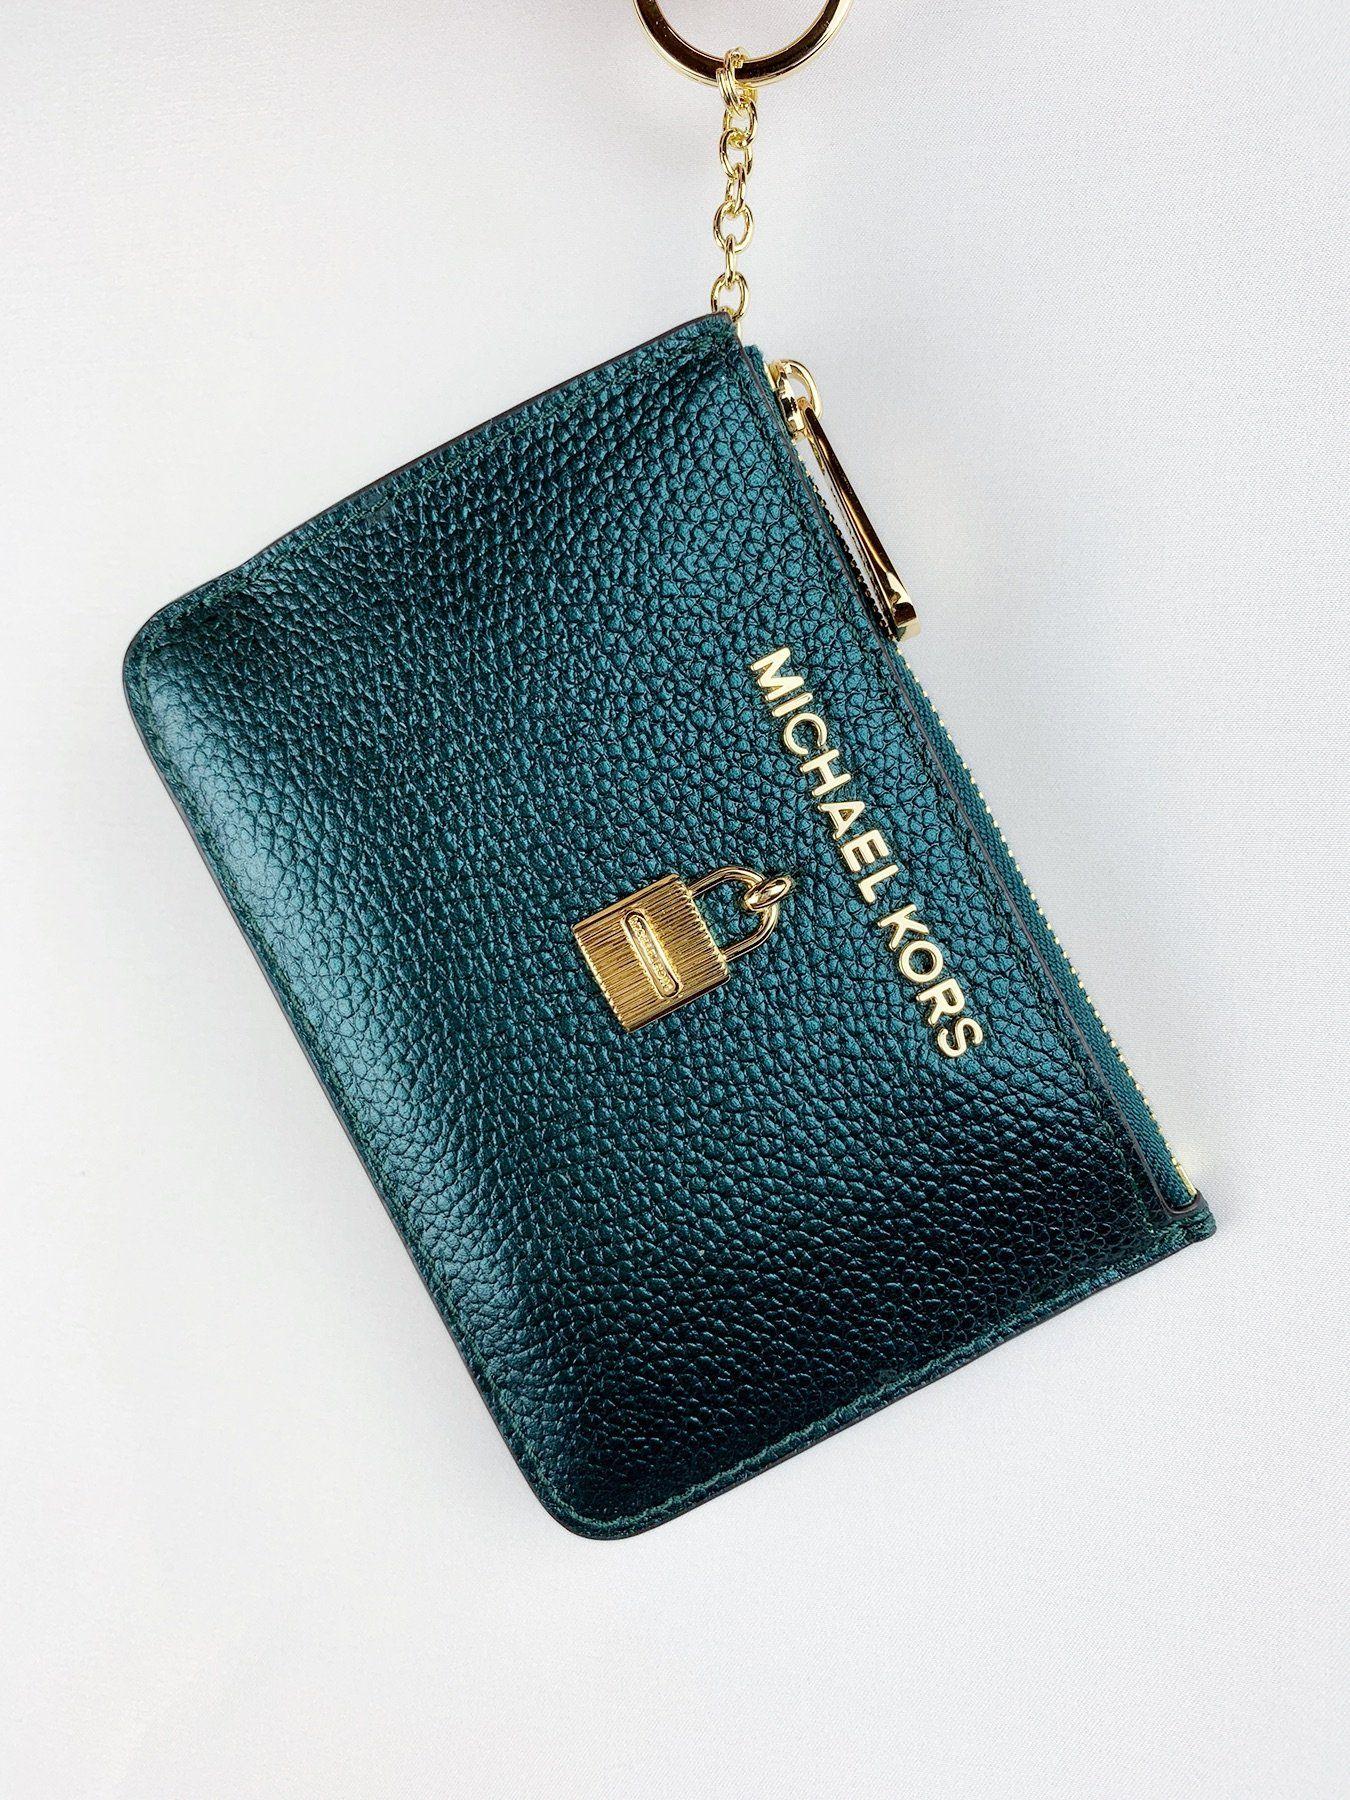 michael kors jet set travel zip coin wallet id keyring card holder rh pinterest com